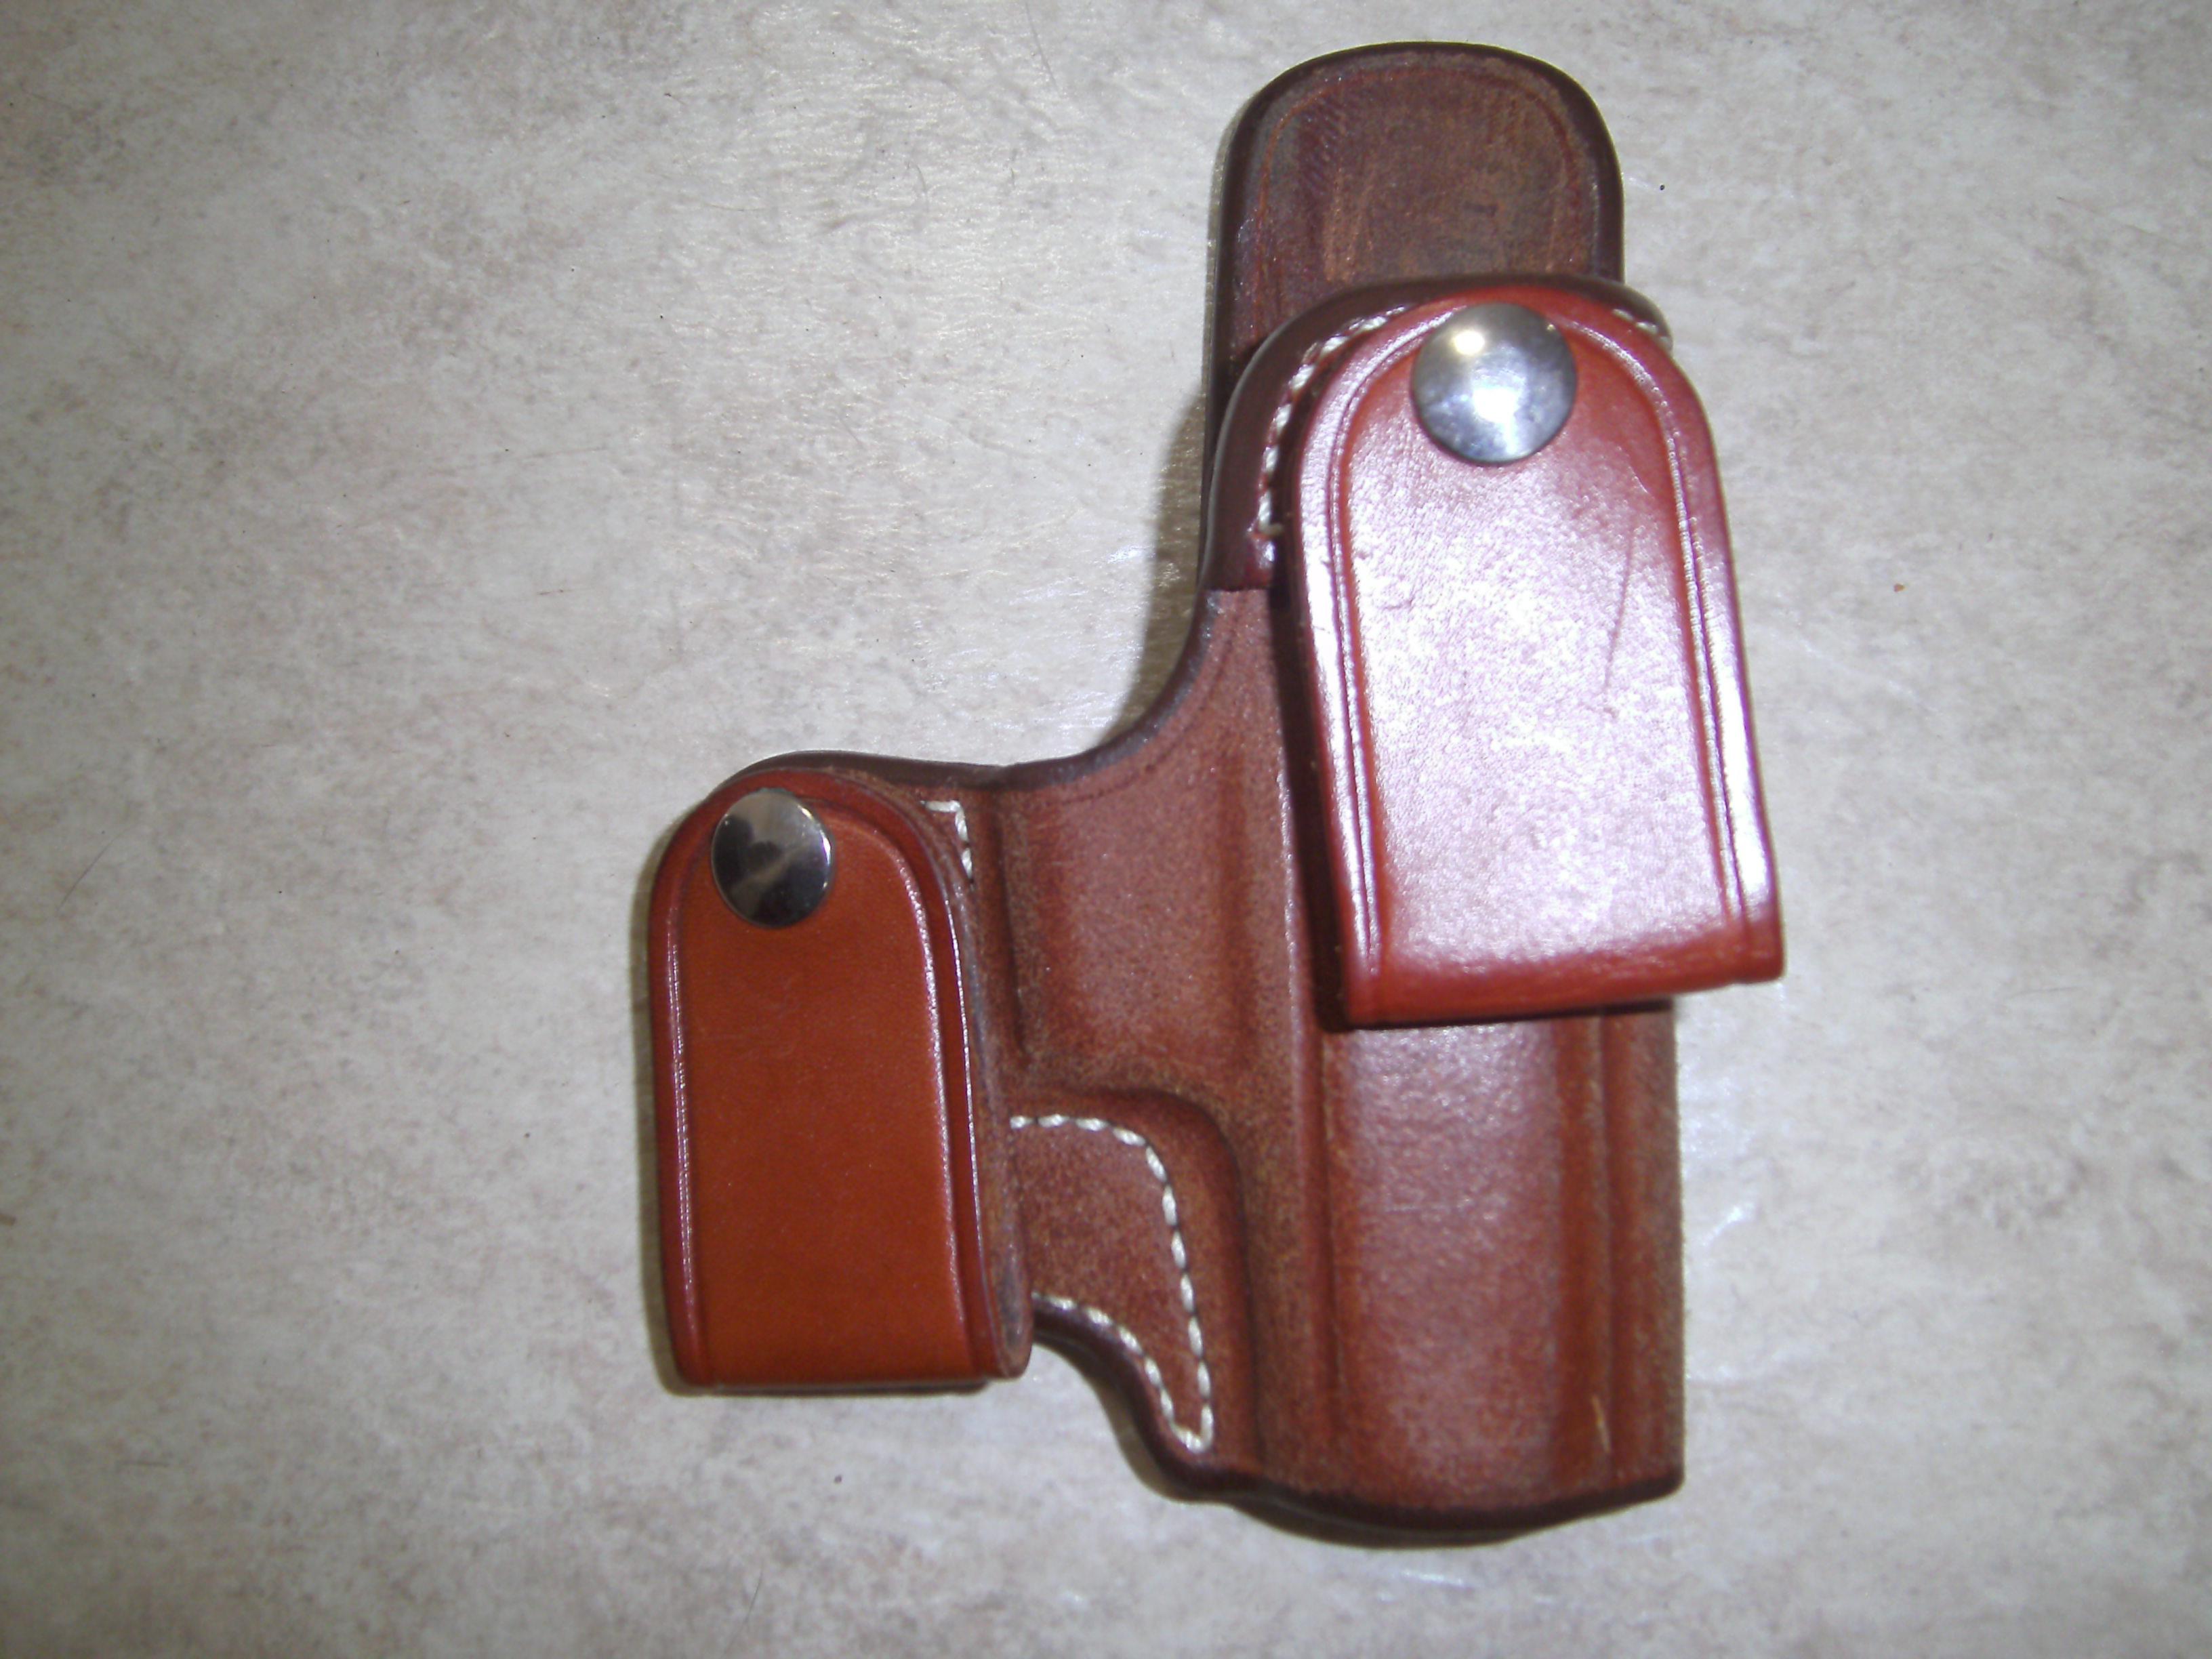 P7 PSP Gunleather for sale-sany1663.jpg